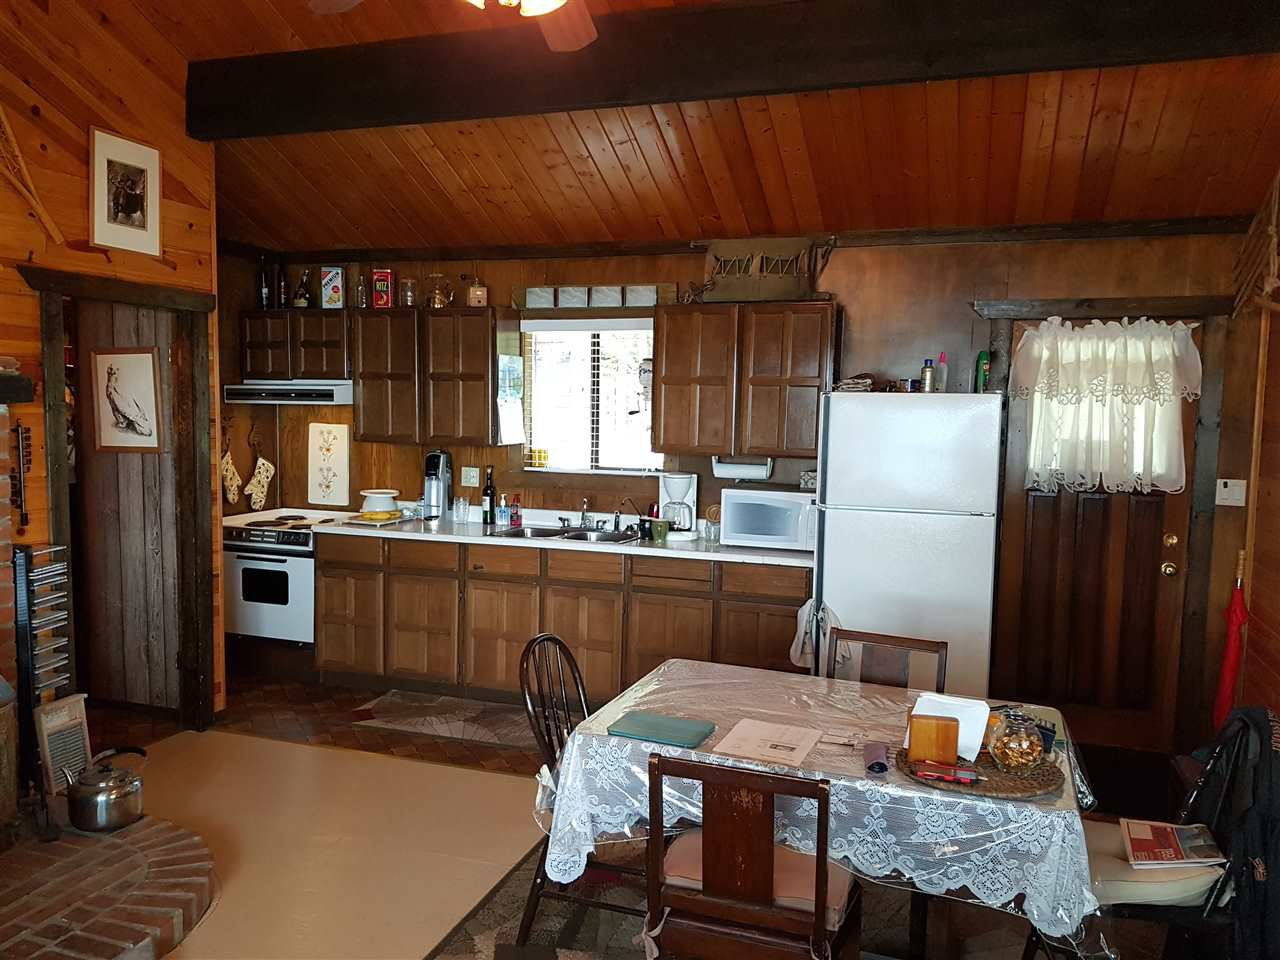 Photo 10: Photos: 7898 DEAN Road in Bridge Lake: Bridge Lake/Sheridan Lake House for sale (100 Mile House (Zone 10))  : MLS®# R2274404